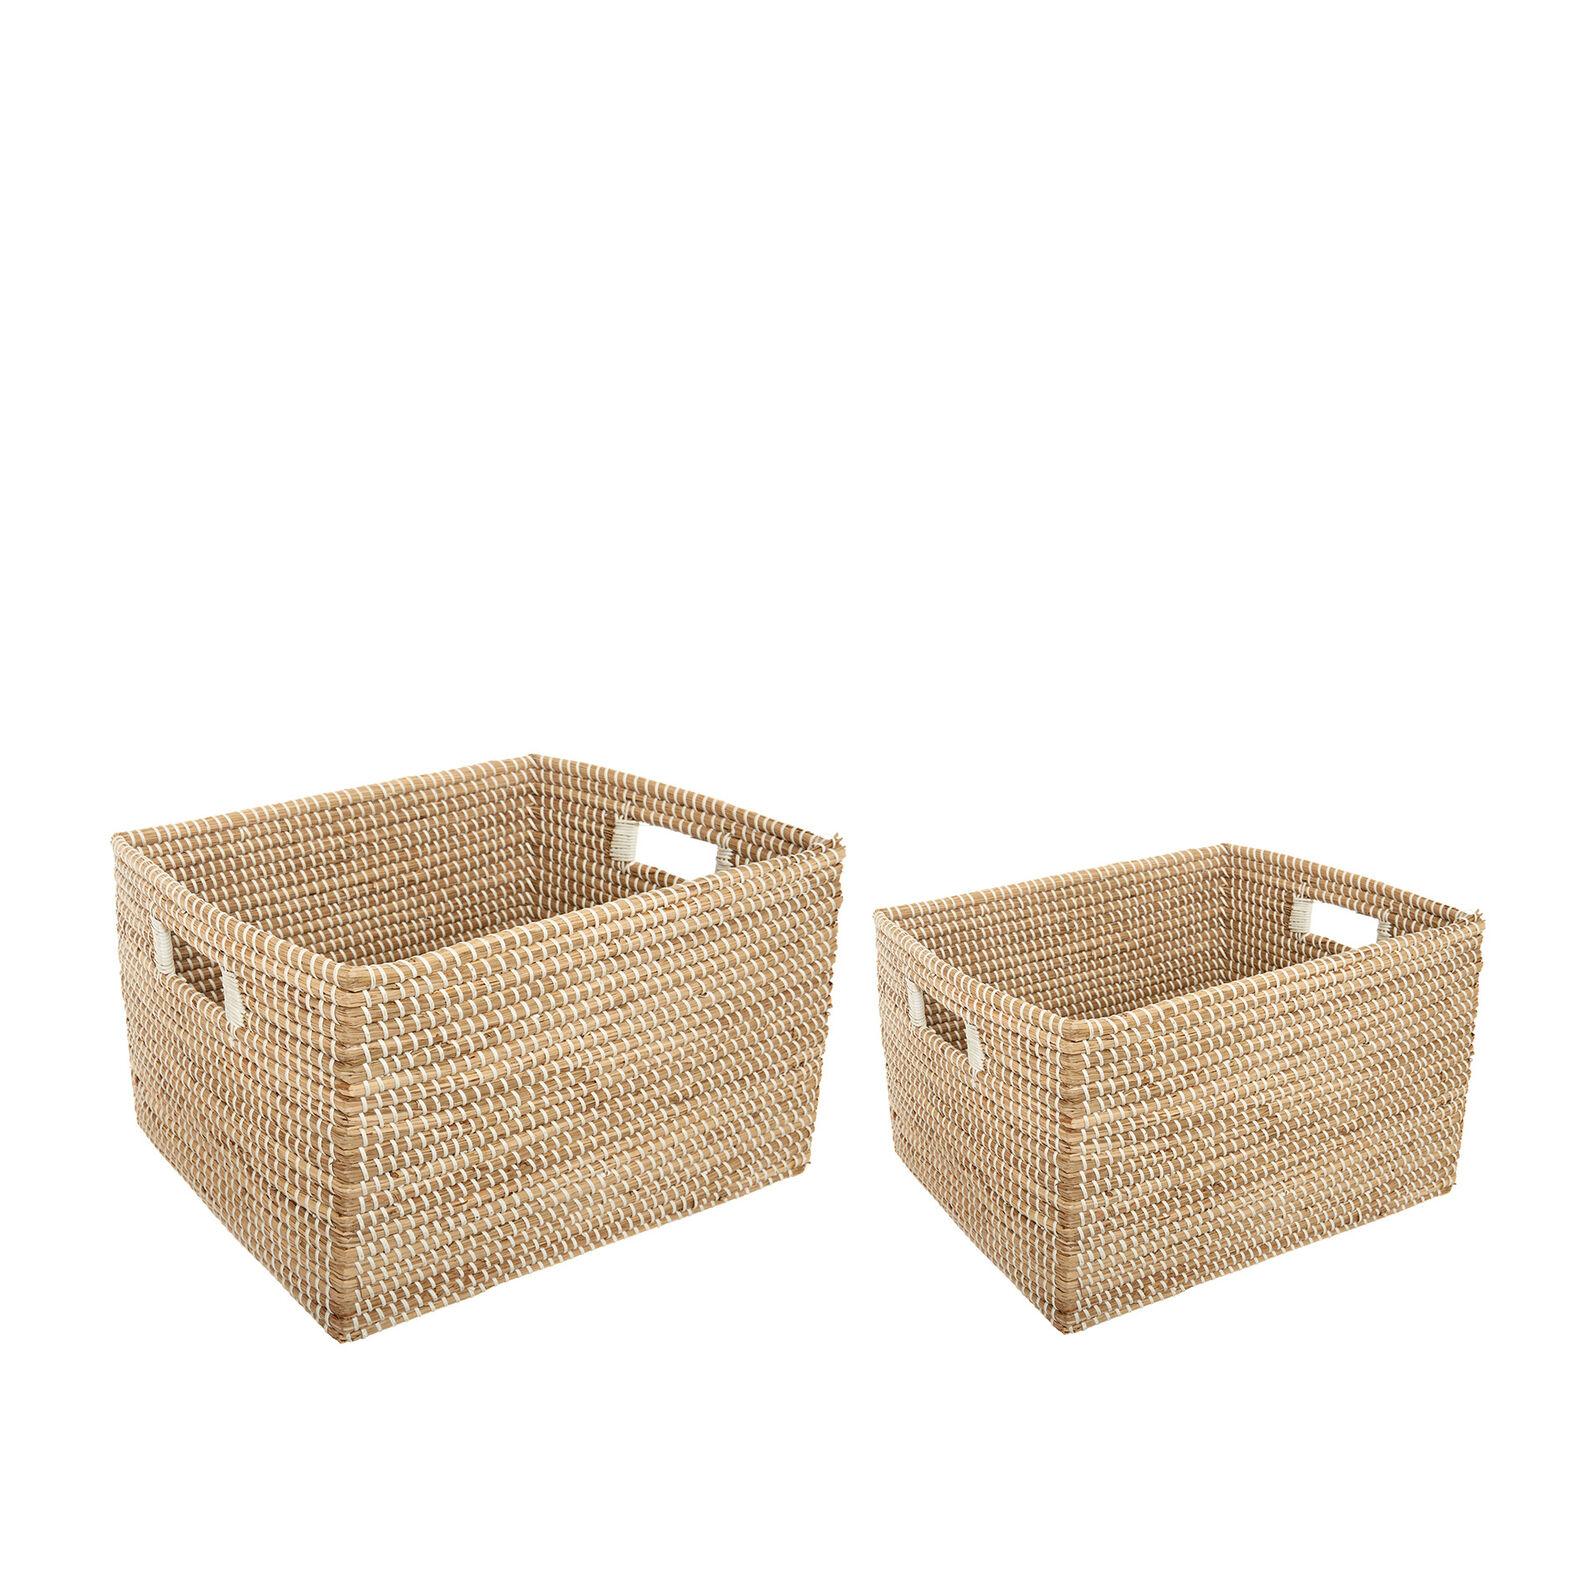 Handmade seagrass basket